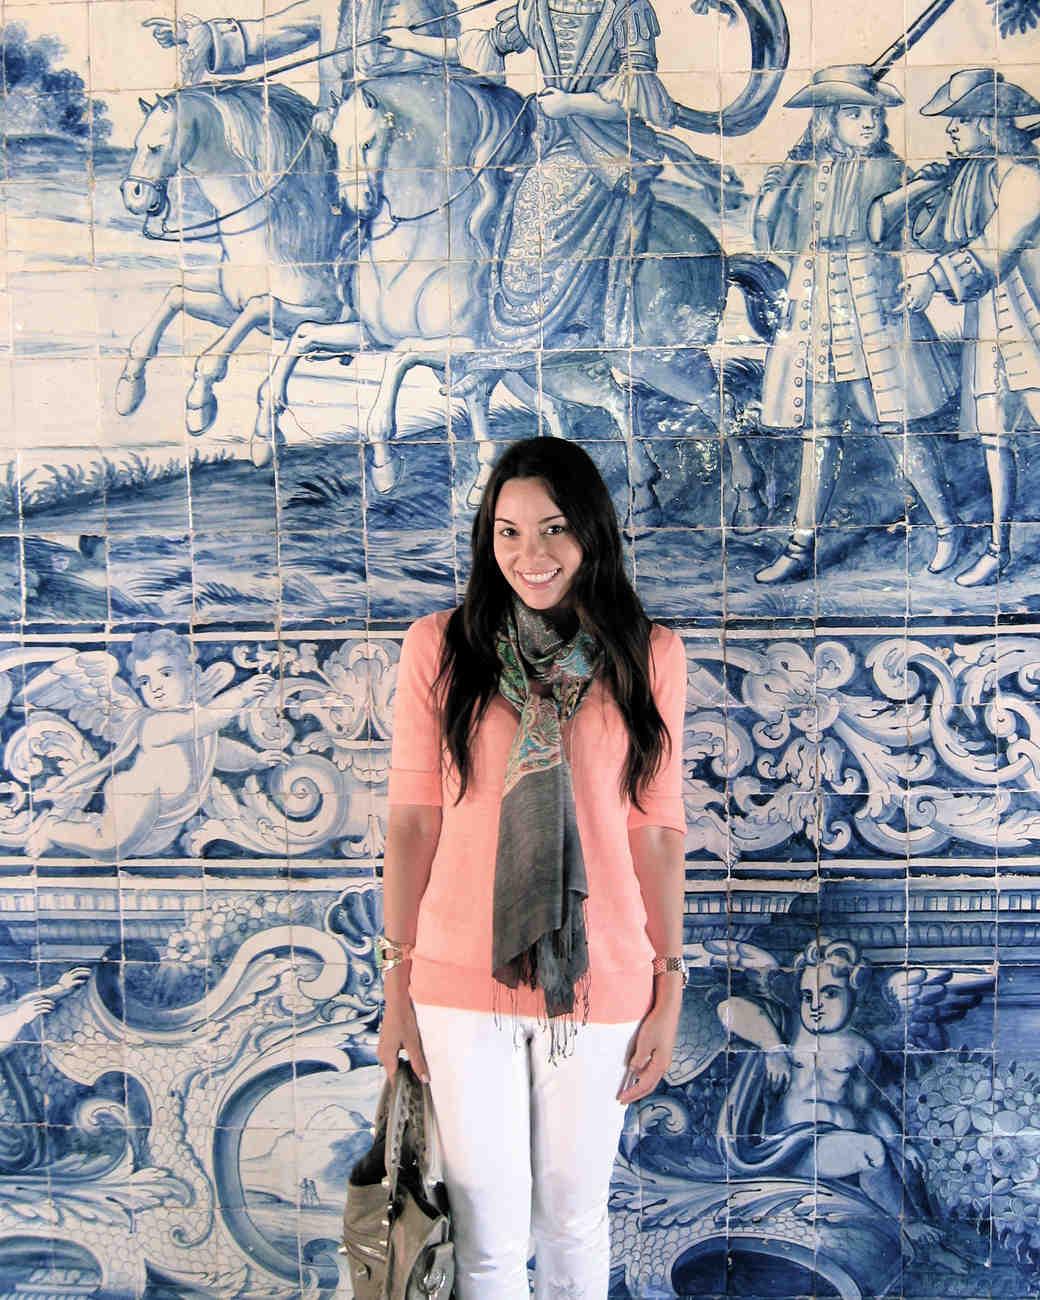 blue-wall-img-3804-s111880.jpg